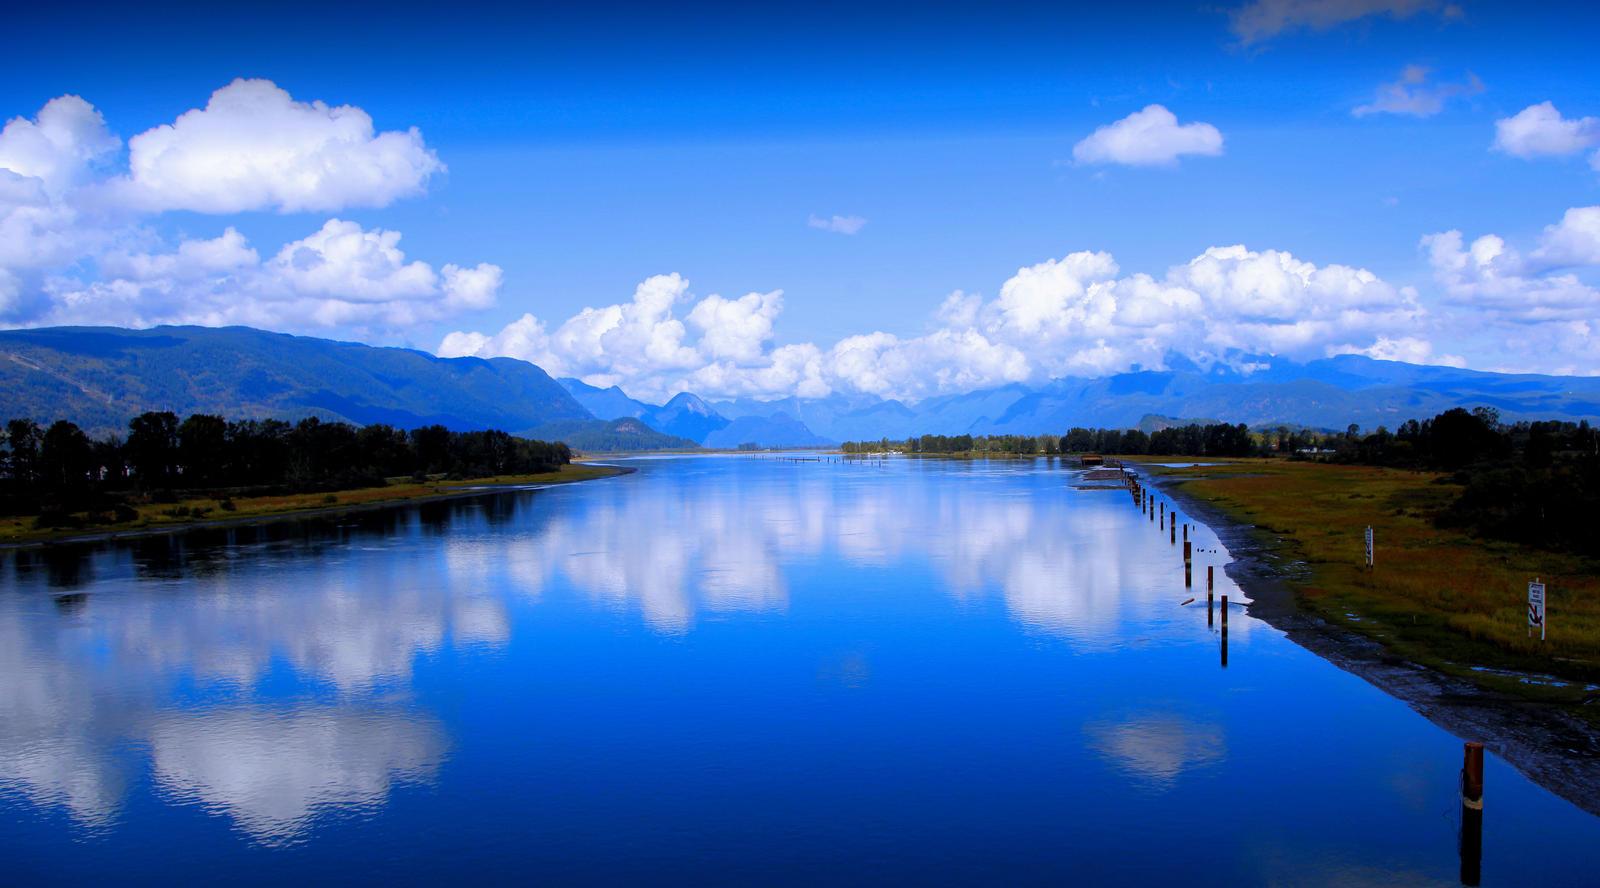 Pitt River north by iamkjelstrup